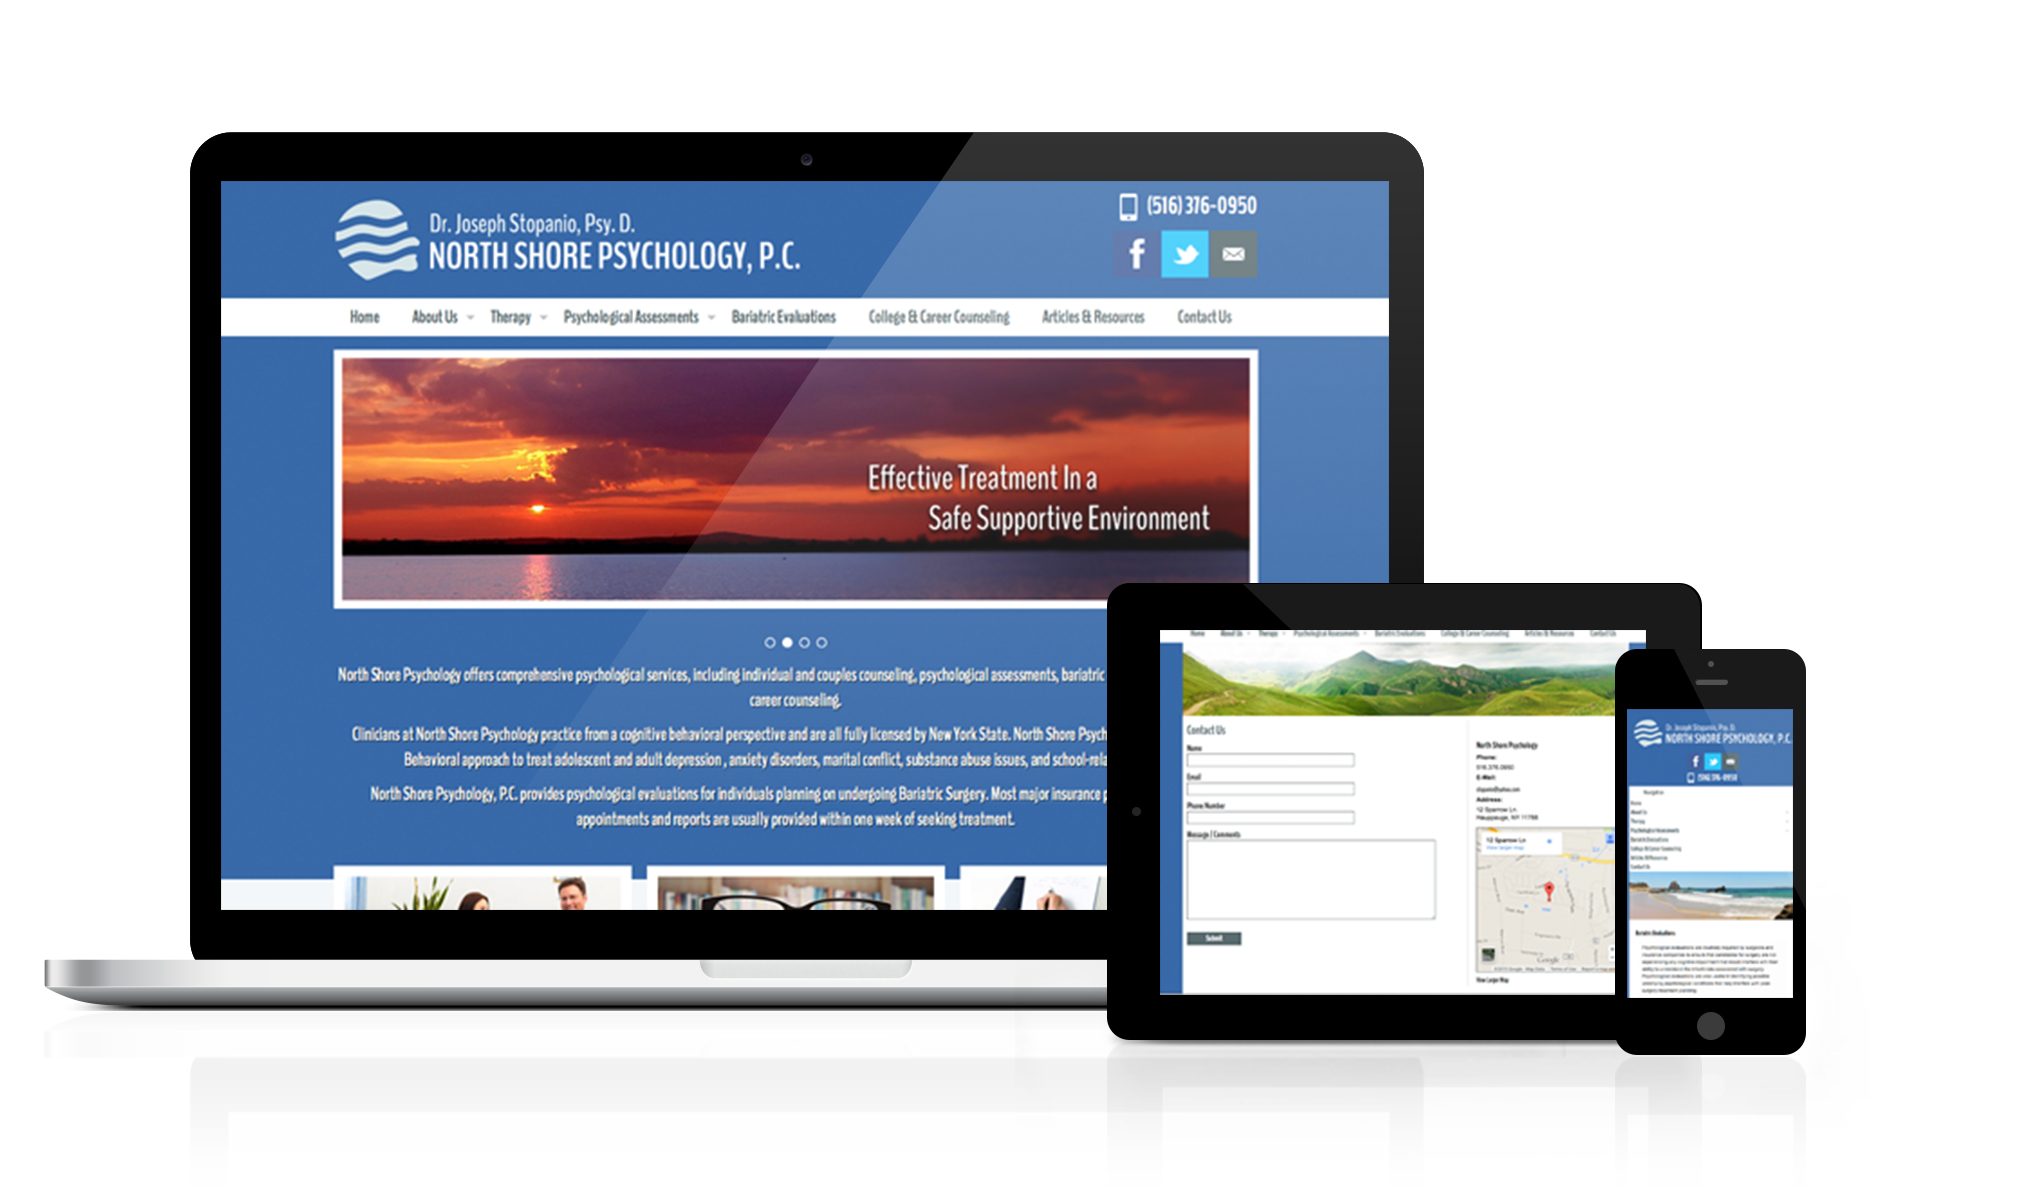 https://www.logicwebmedia.com/new-site/wp-content/uploads/top-image-all-new-hands-northshore.jpg